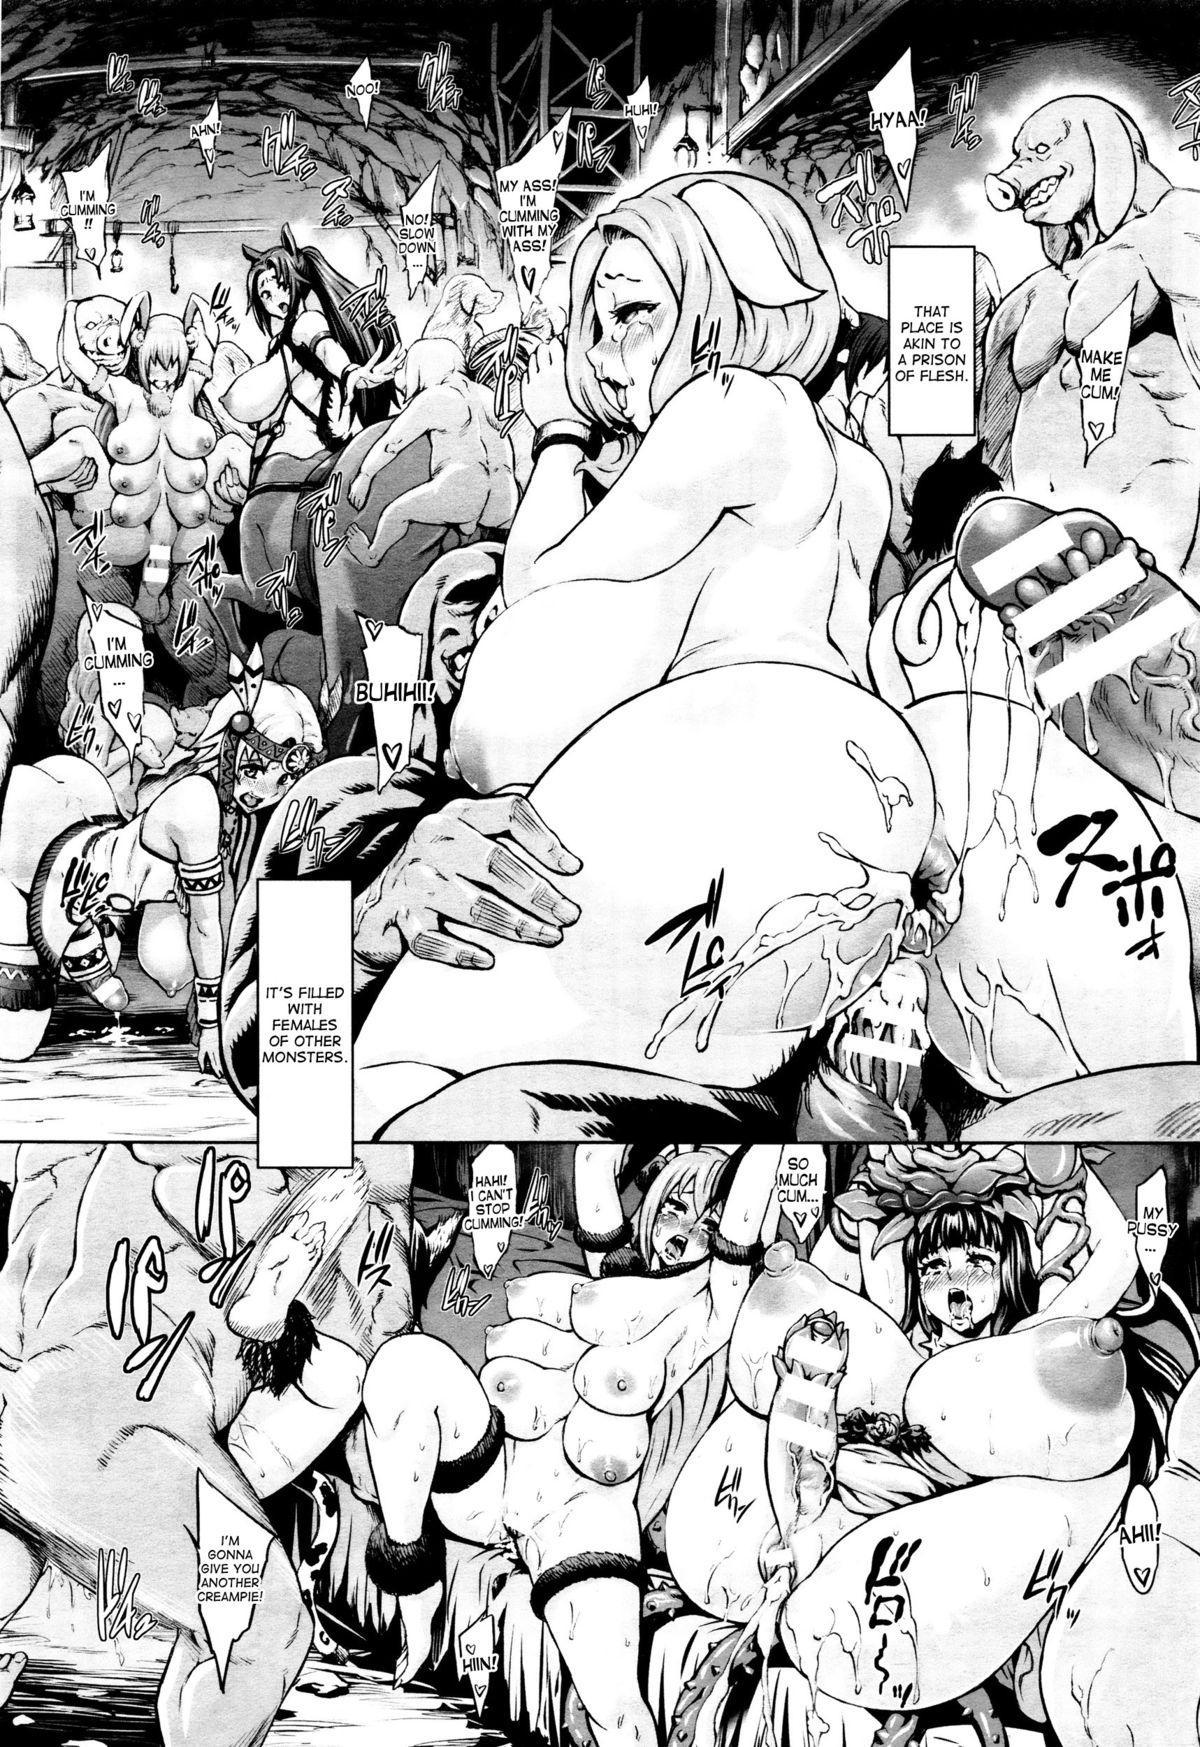 [Neromashin] CrossinG KnighTMarE ApocryphA ~Niku no Rougoku~ | Knightmare Apocrypha ~Prison of Flesh~ (COMIC Unreal 2015-12 Vol. 58) [English] [desudesu] 3